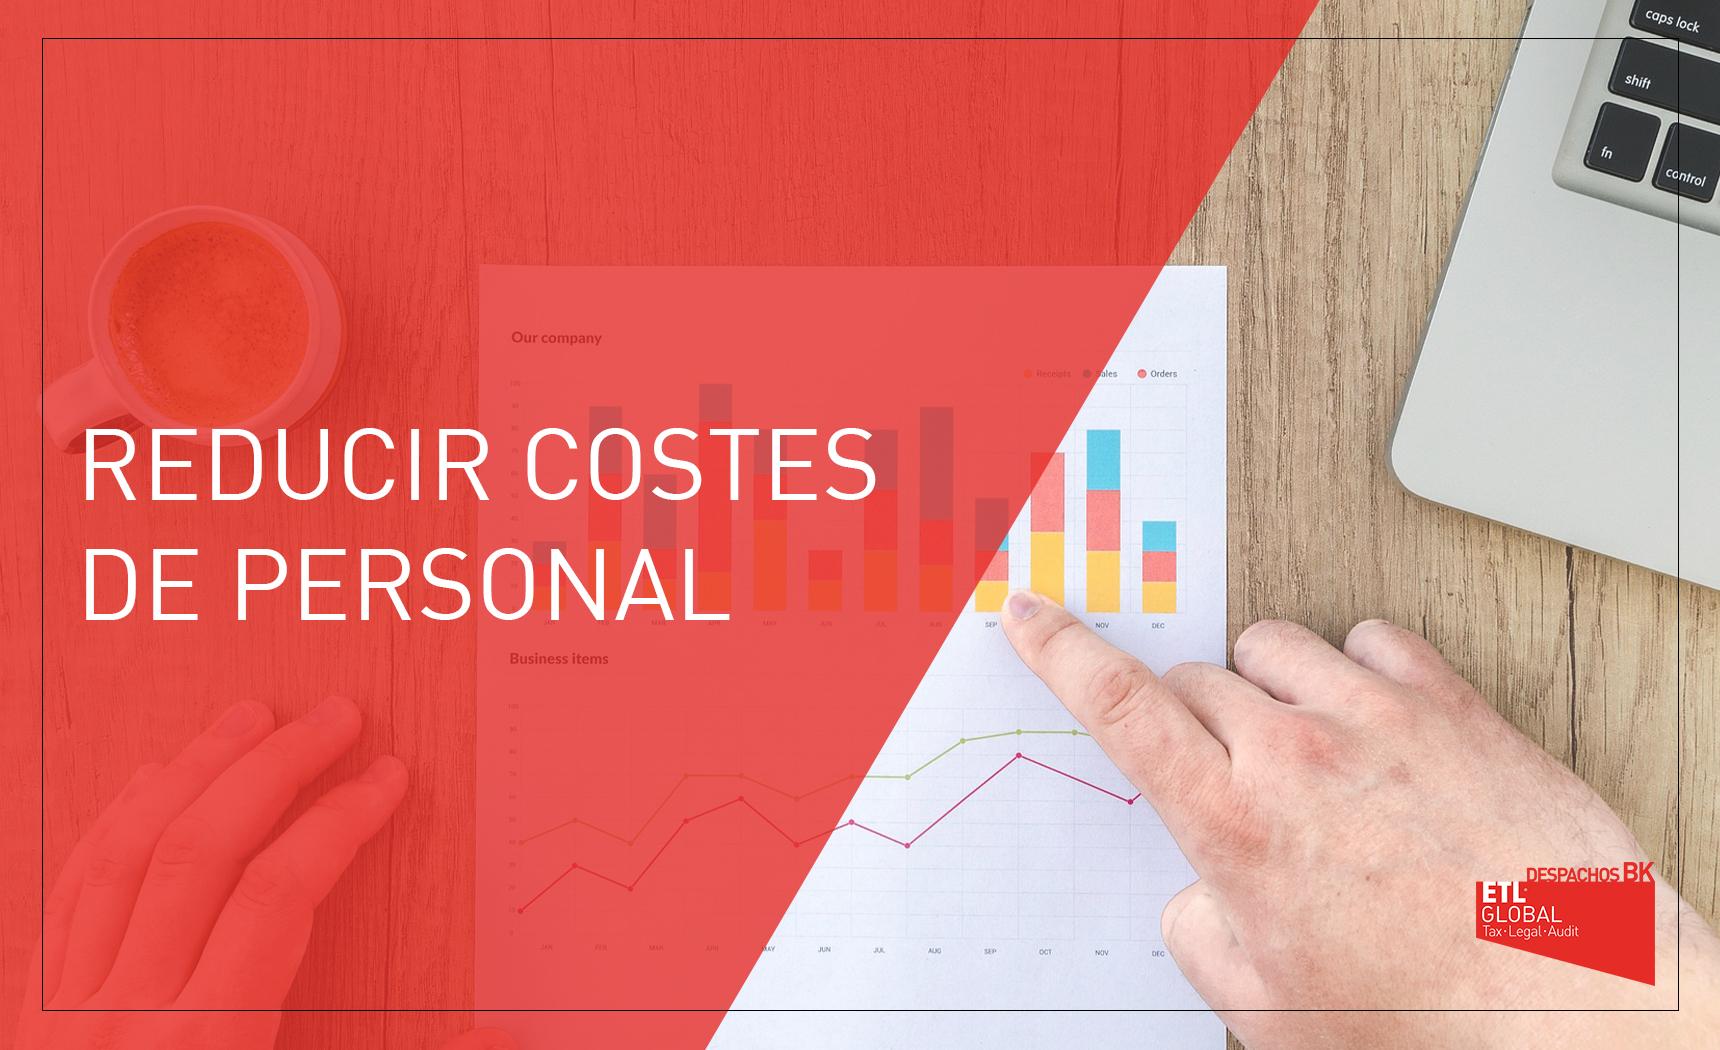 reducir costes de personal - despachos bk etl